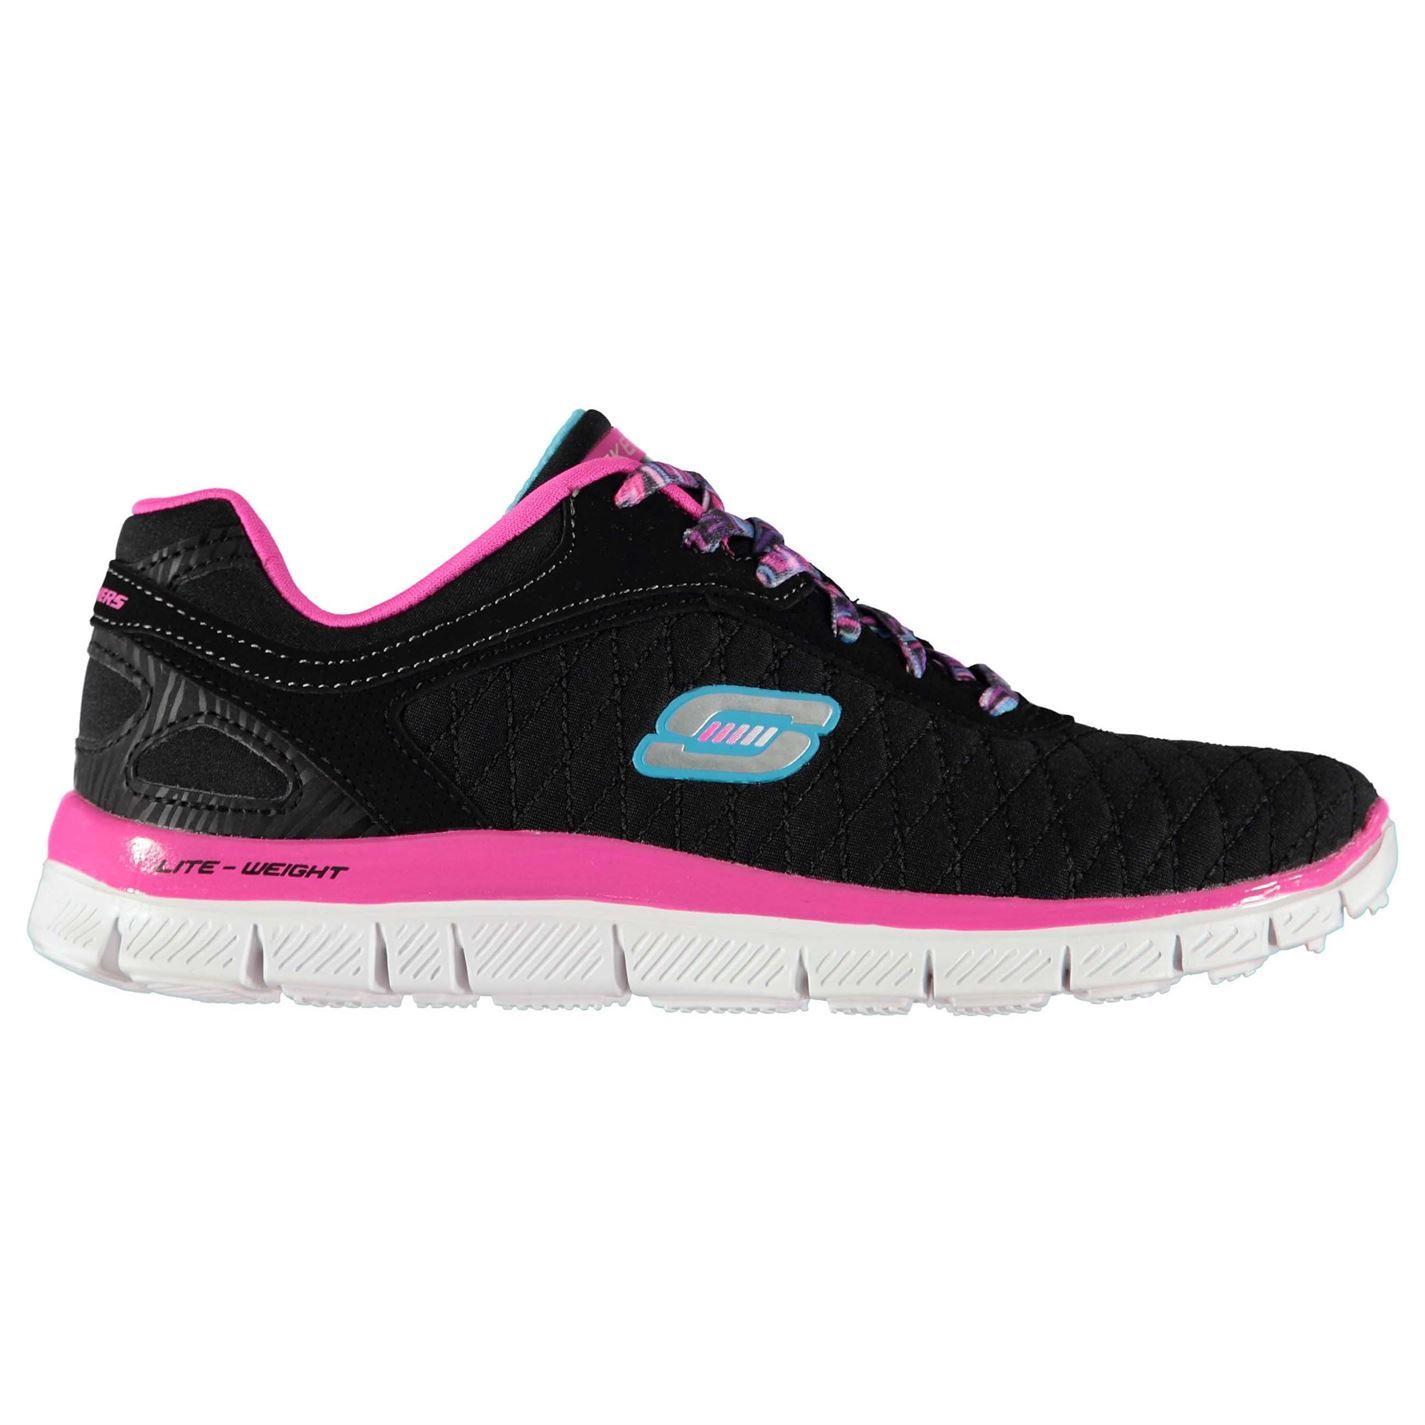 Skechers-Kids-Girls-Flex-Appeal-Scarpe-da-ginnastica-corridori-Lacci-leggera-comoda